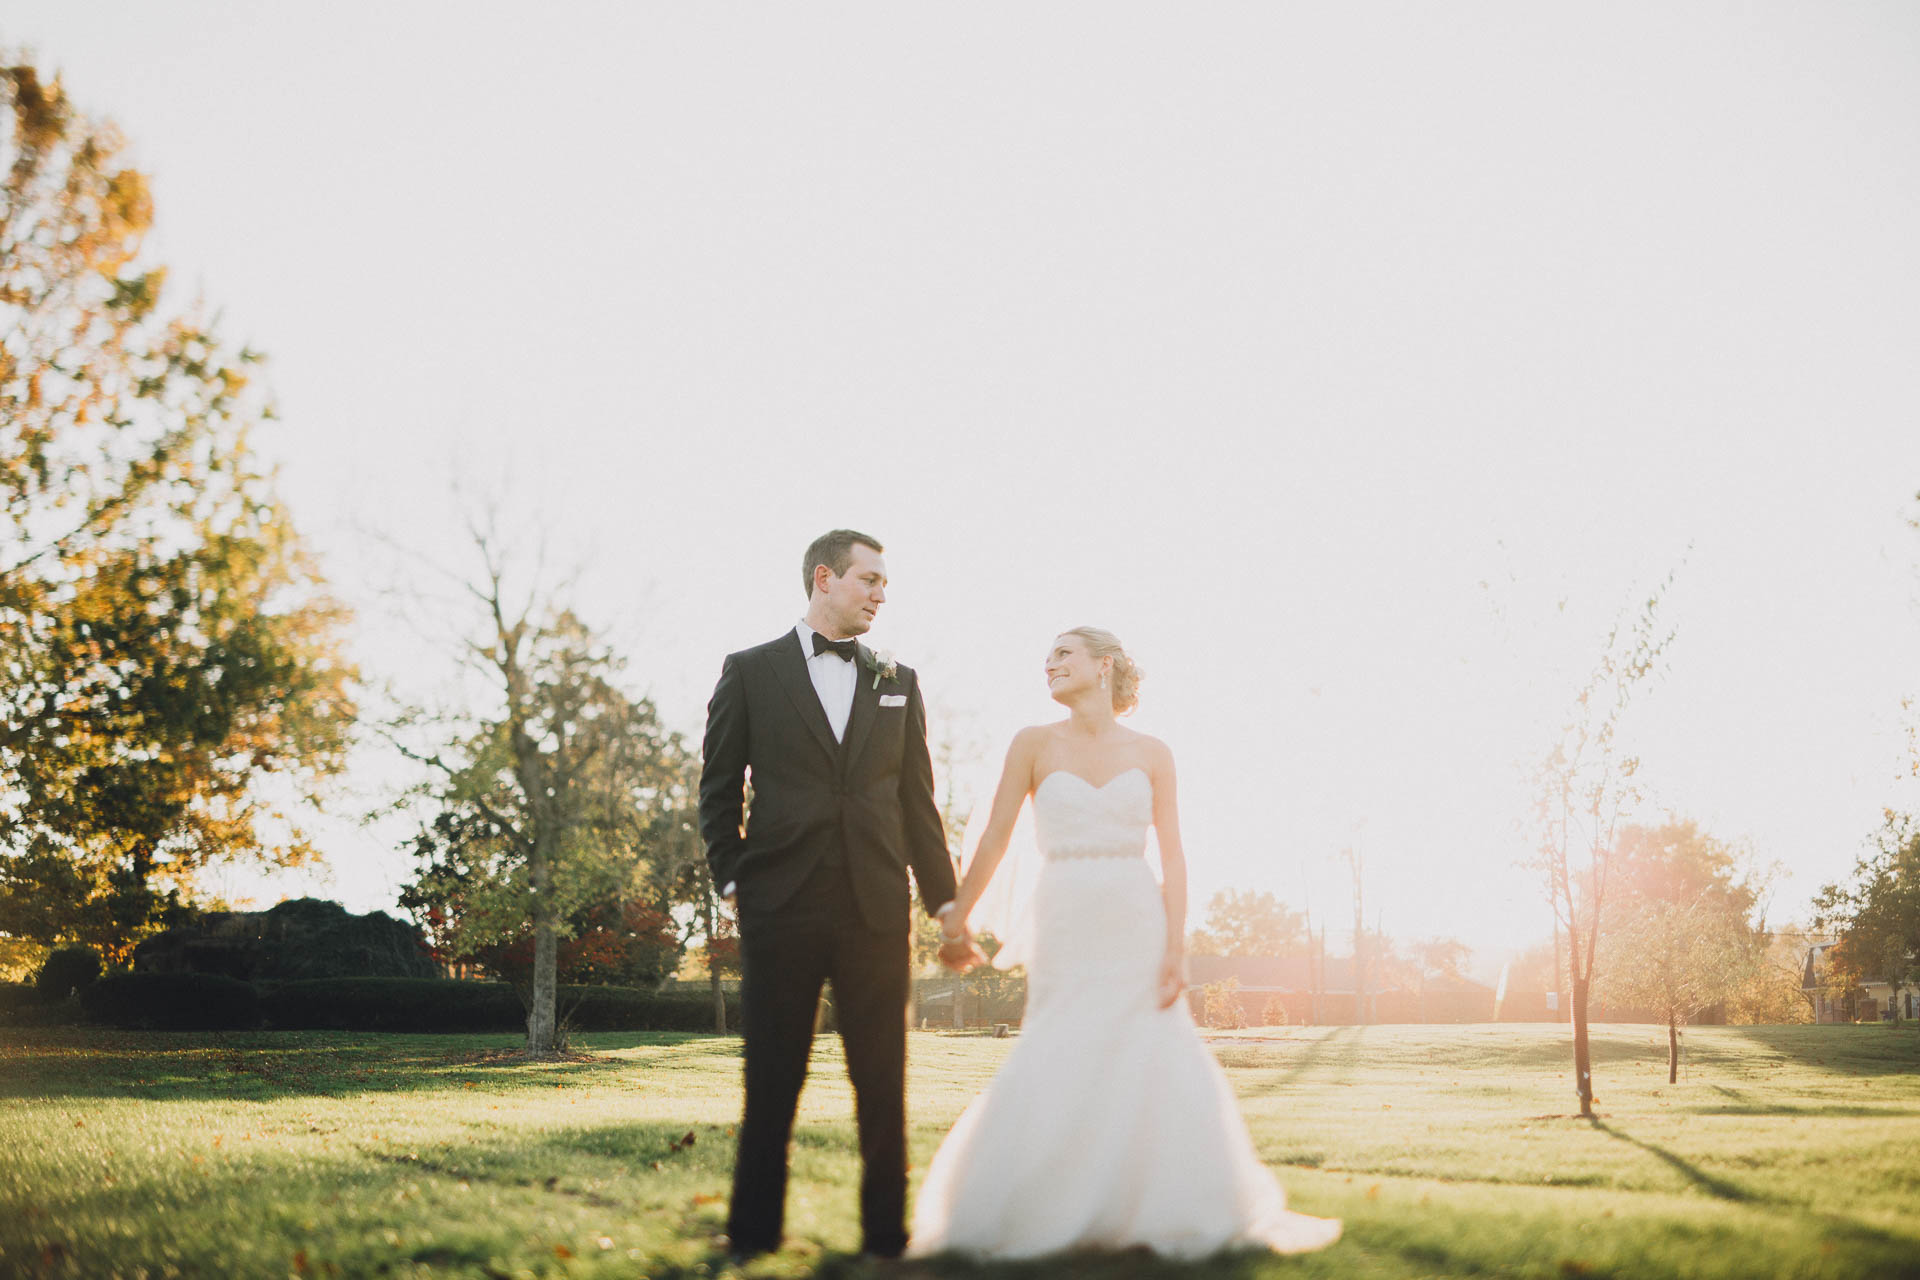 EC-Modern-Cincinnati-Wedding-115@2x.jpg